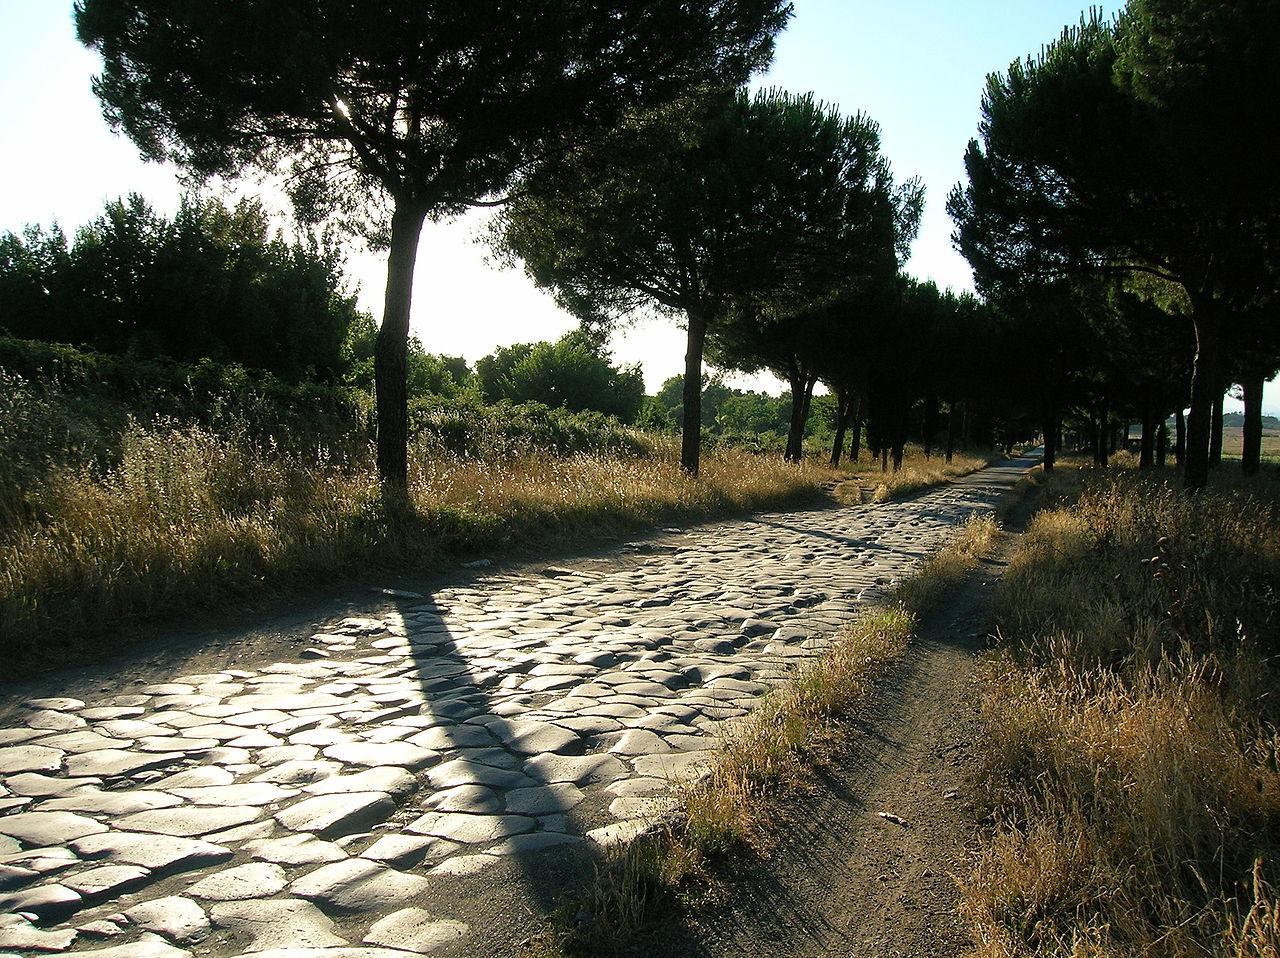 1280px-Appia_antica_2-7-05_062.jpg